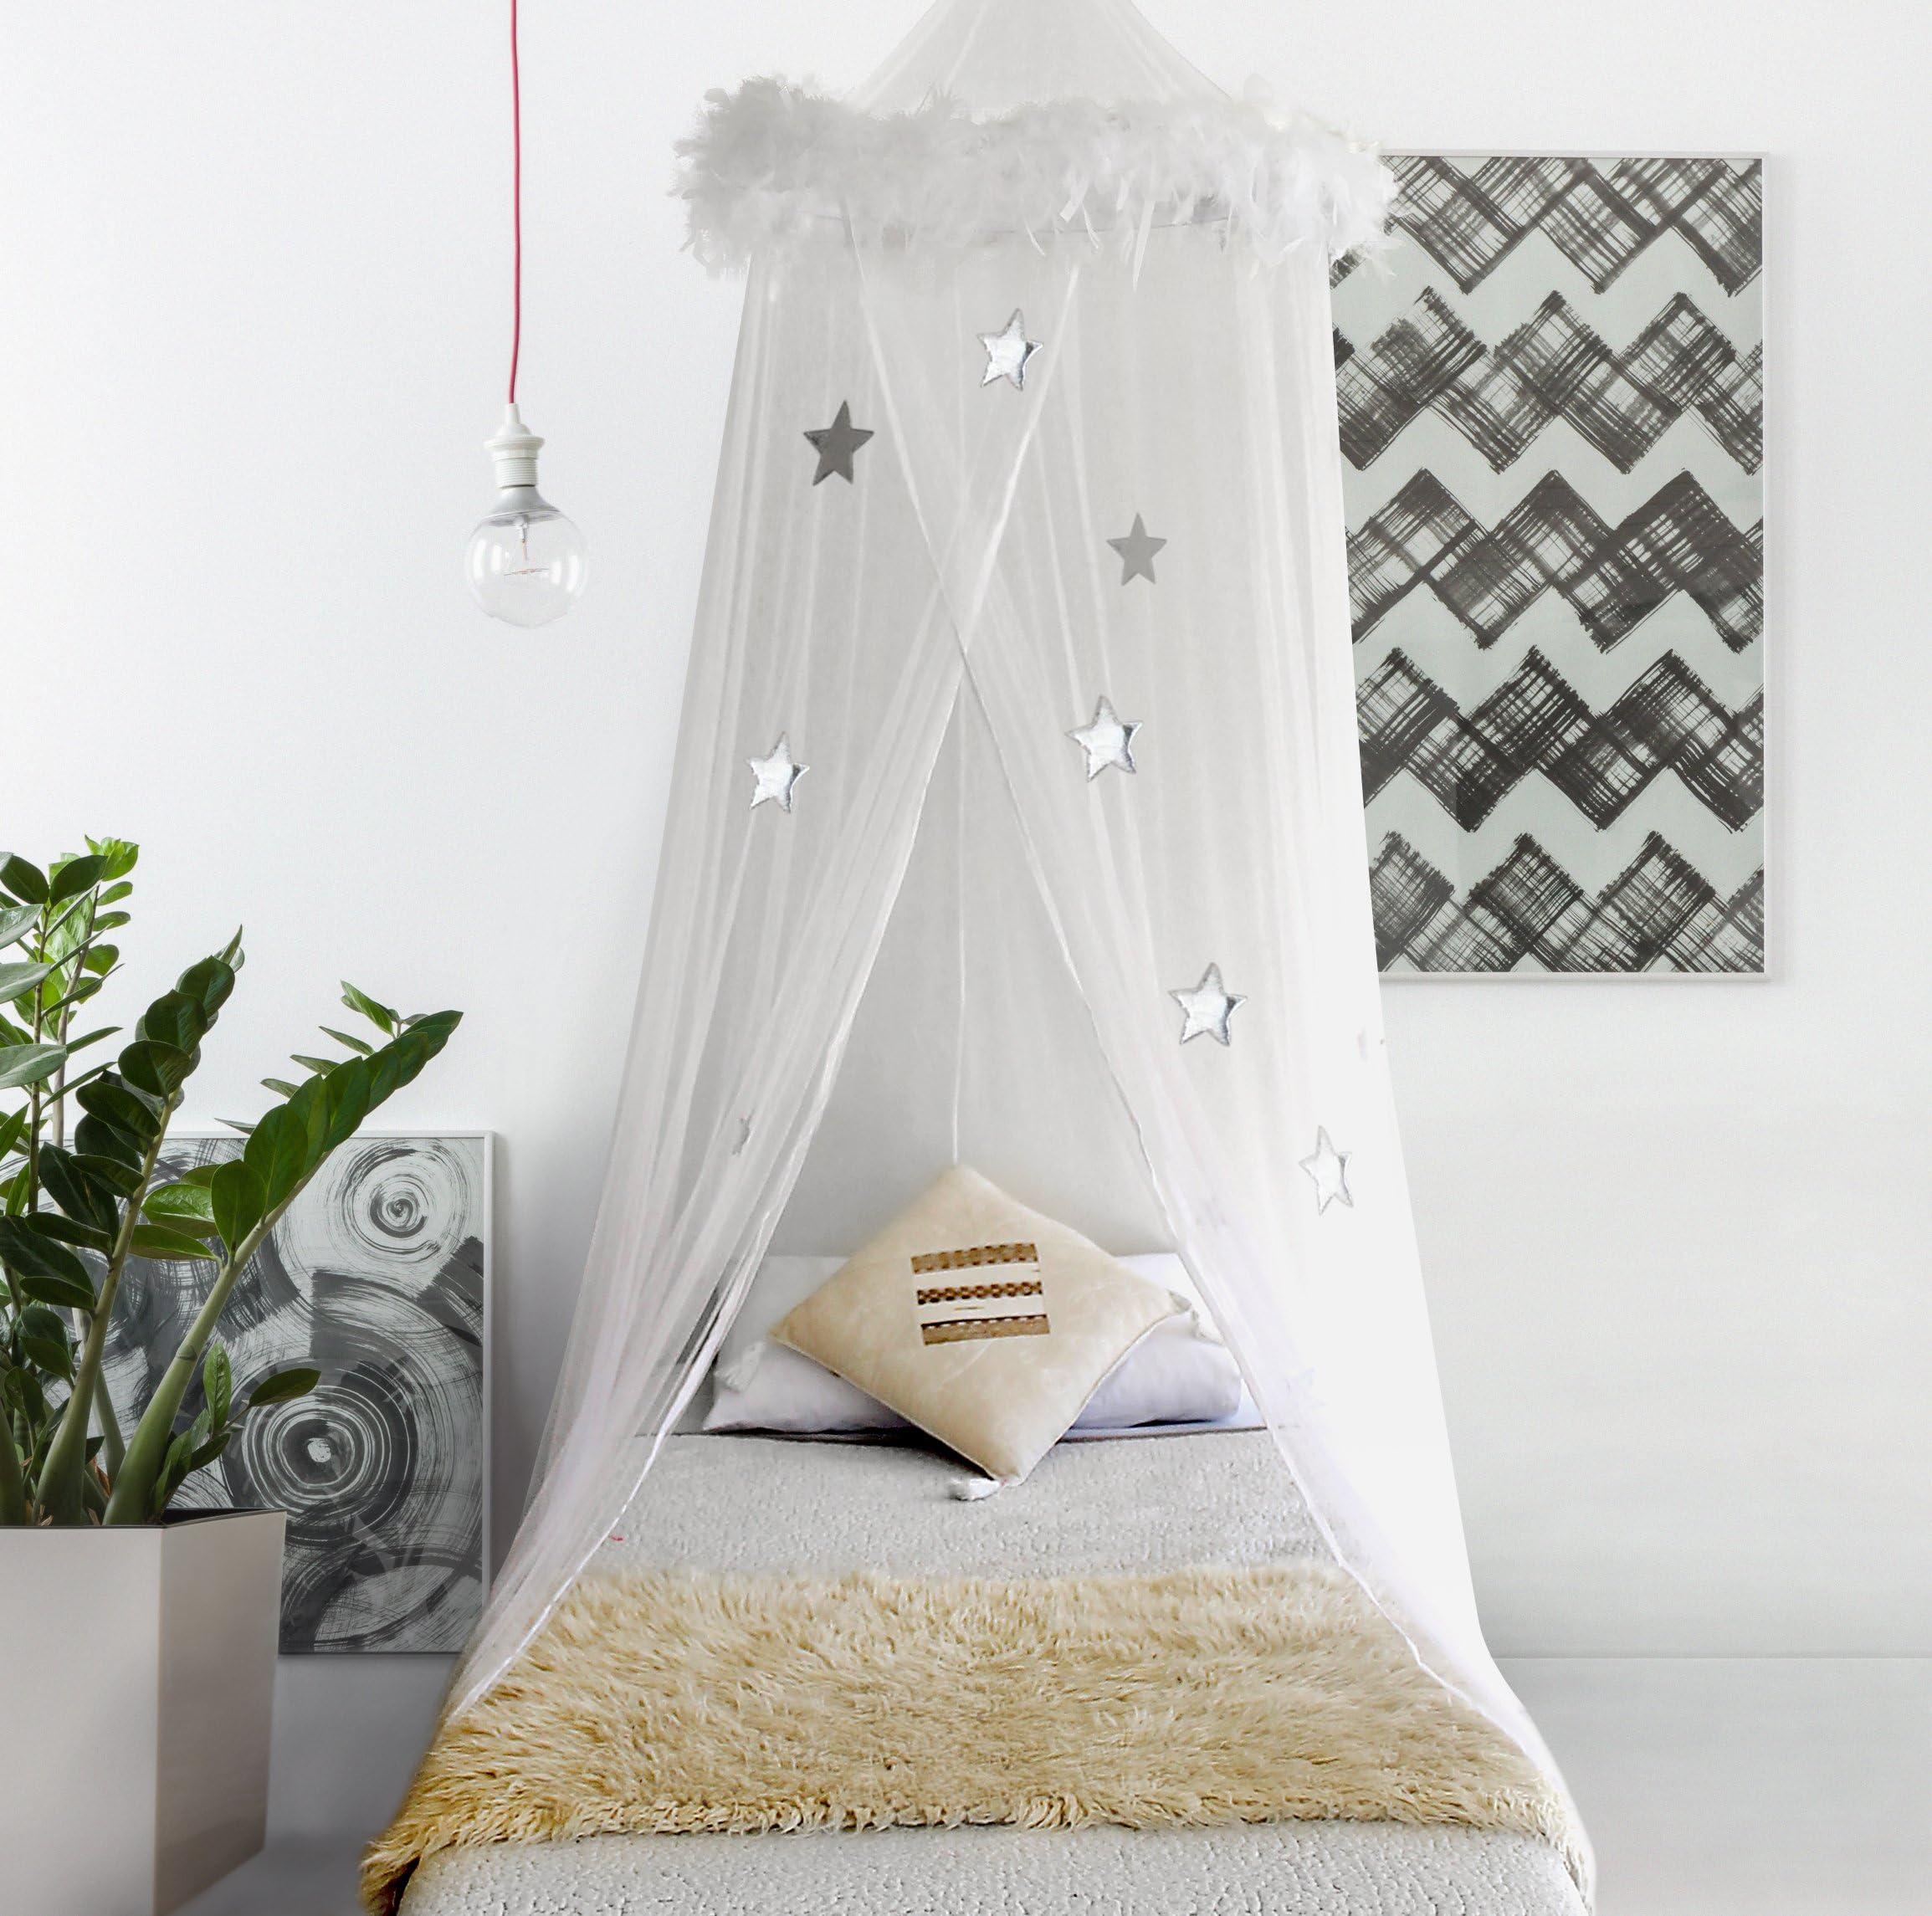 Boho ...  sc 1 st  Amazon.com & Shop Amazon.com | Bed Canopies u0026 Drapes